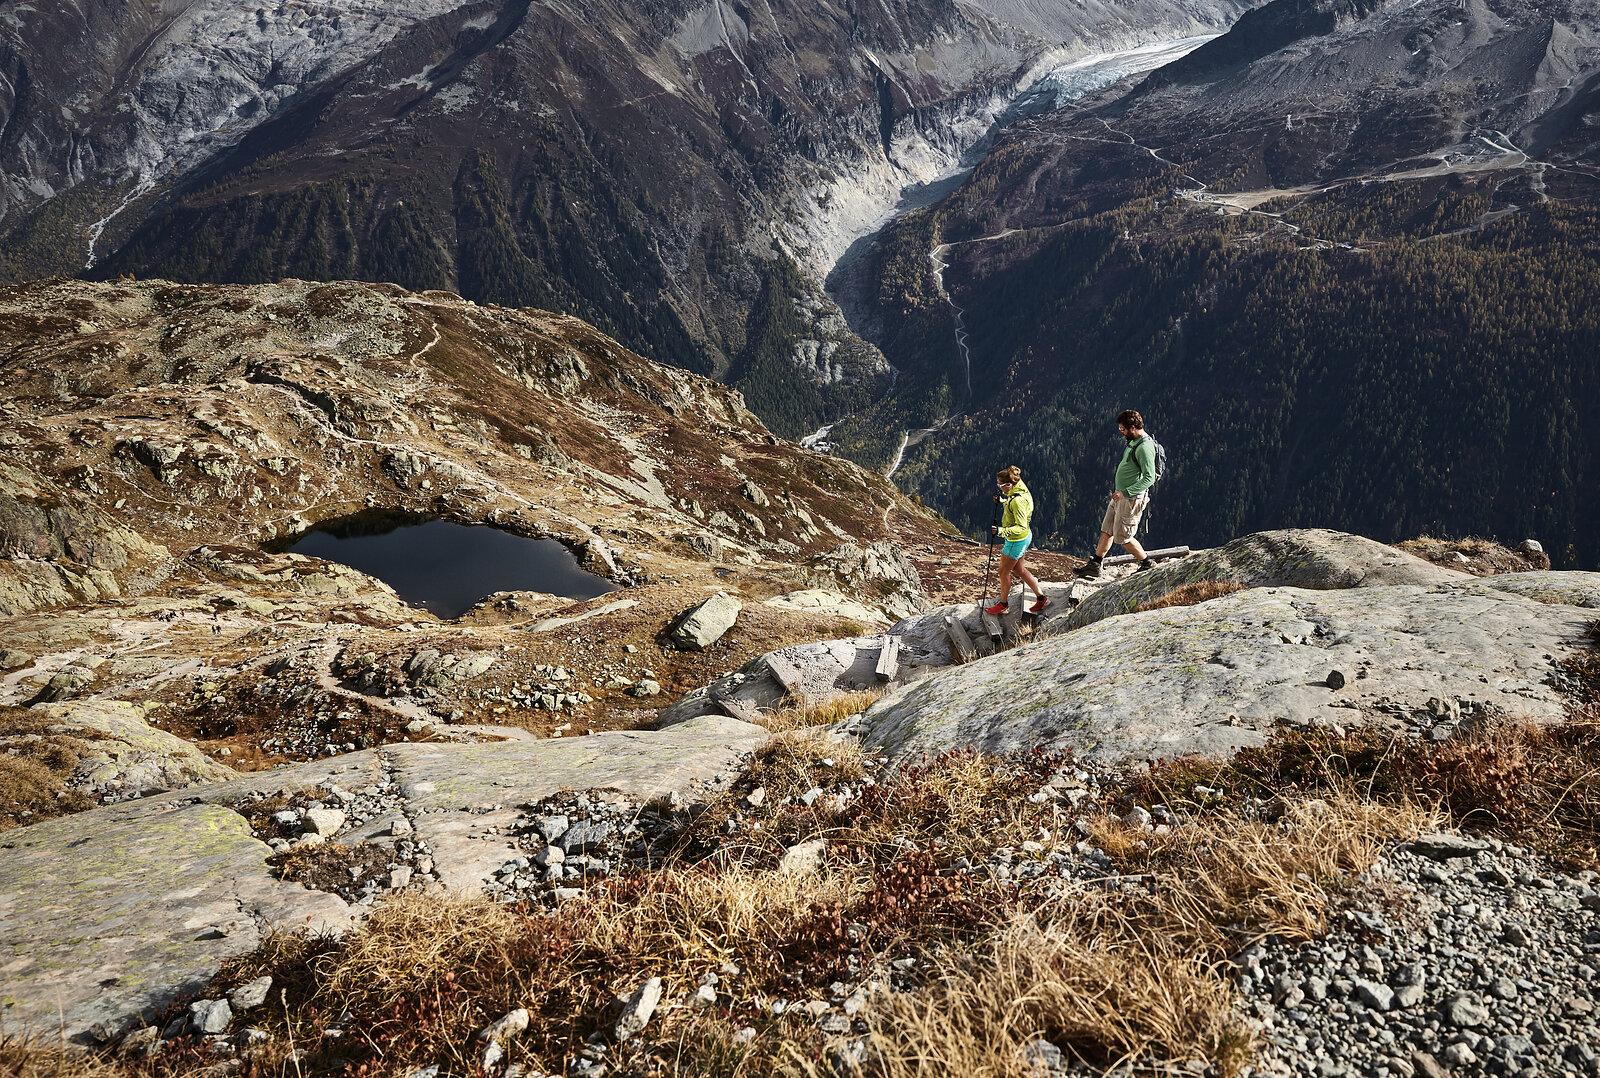 chamonix, hiking, mountaineering, mountains, outdoors